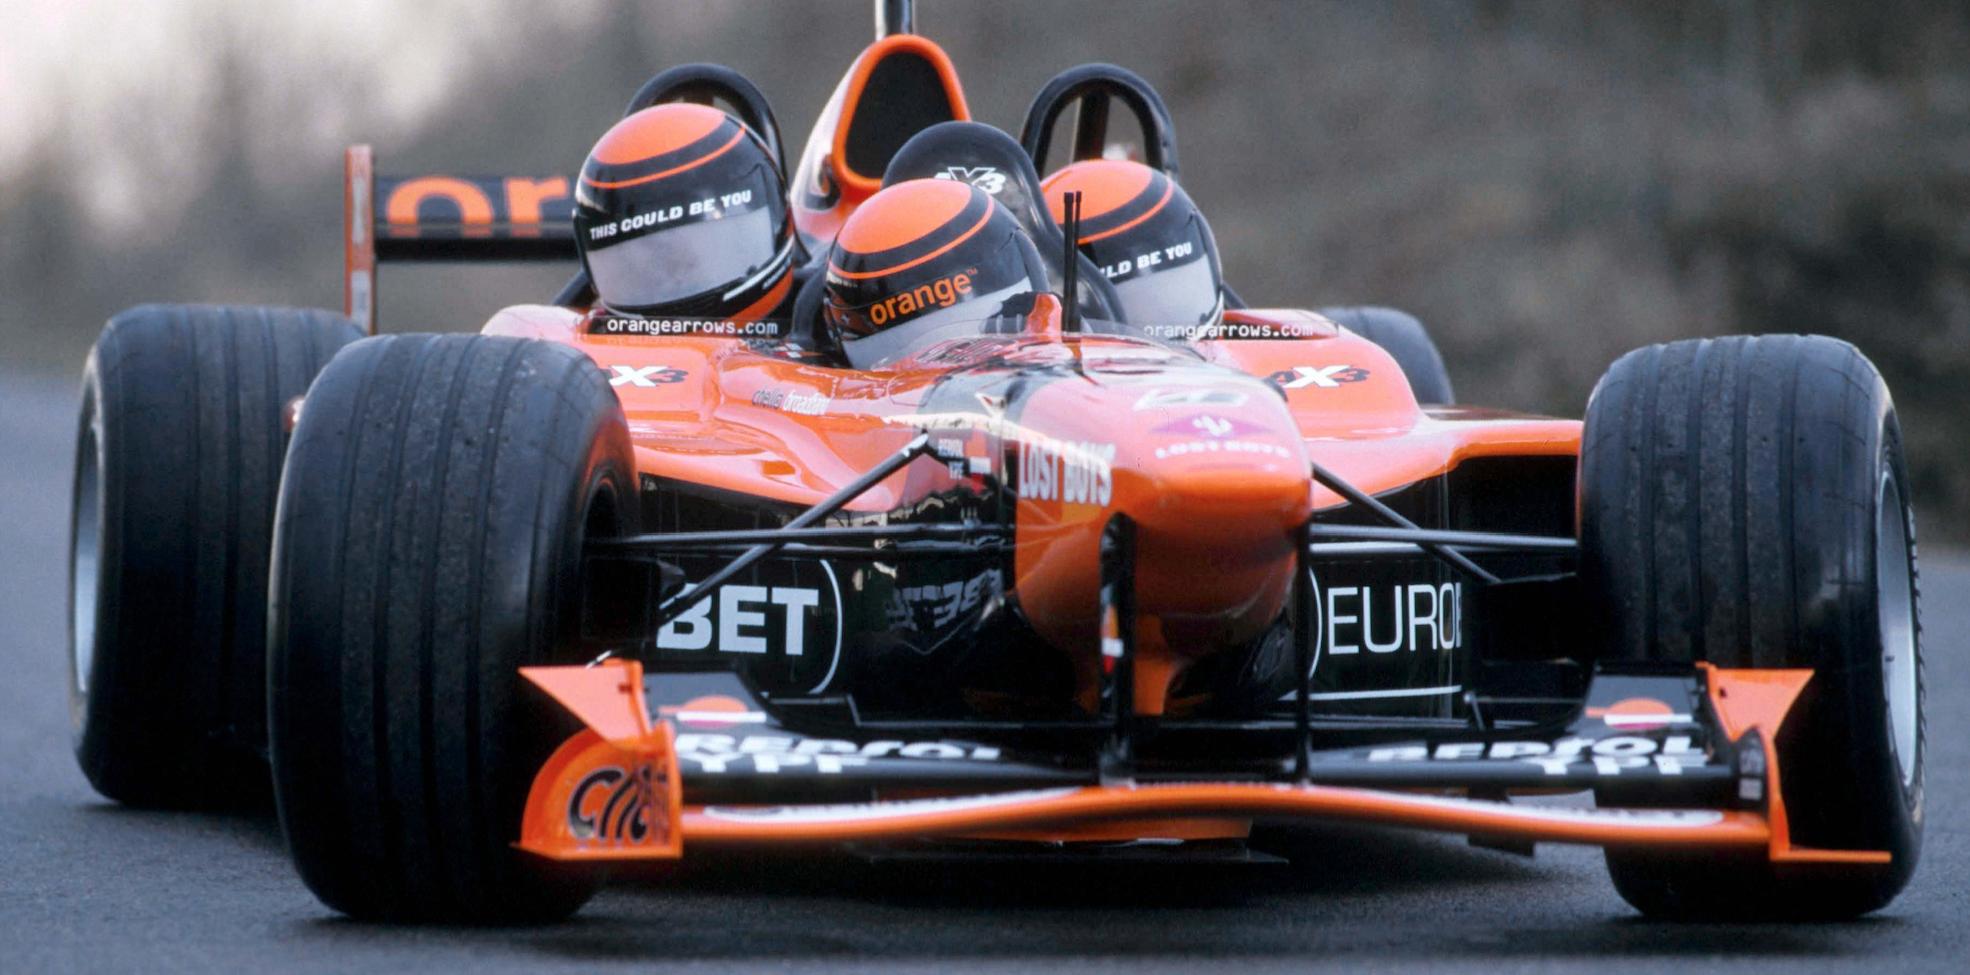 Buy This Three Seater Formula 1 Car